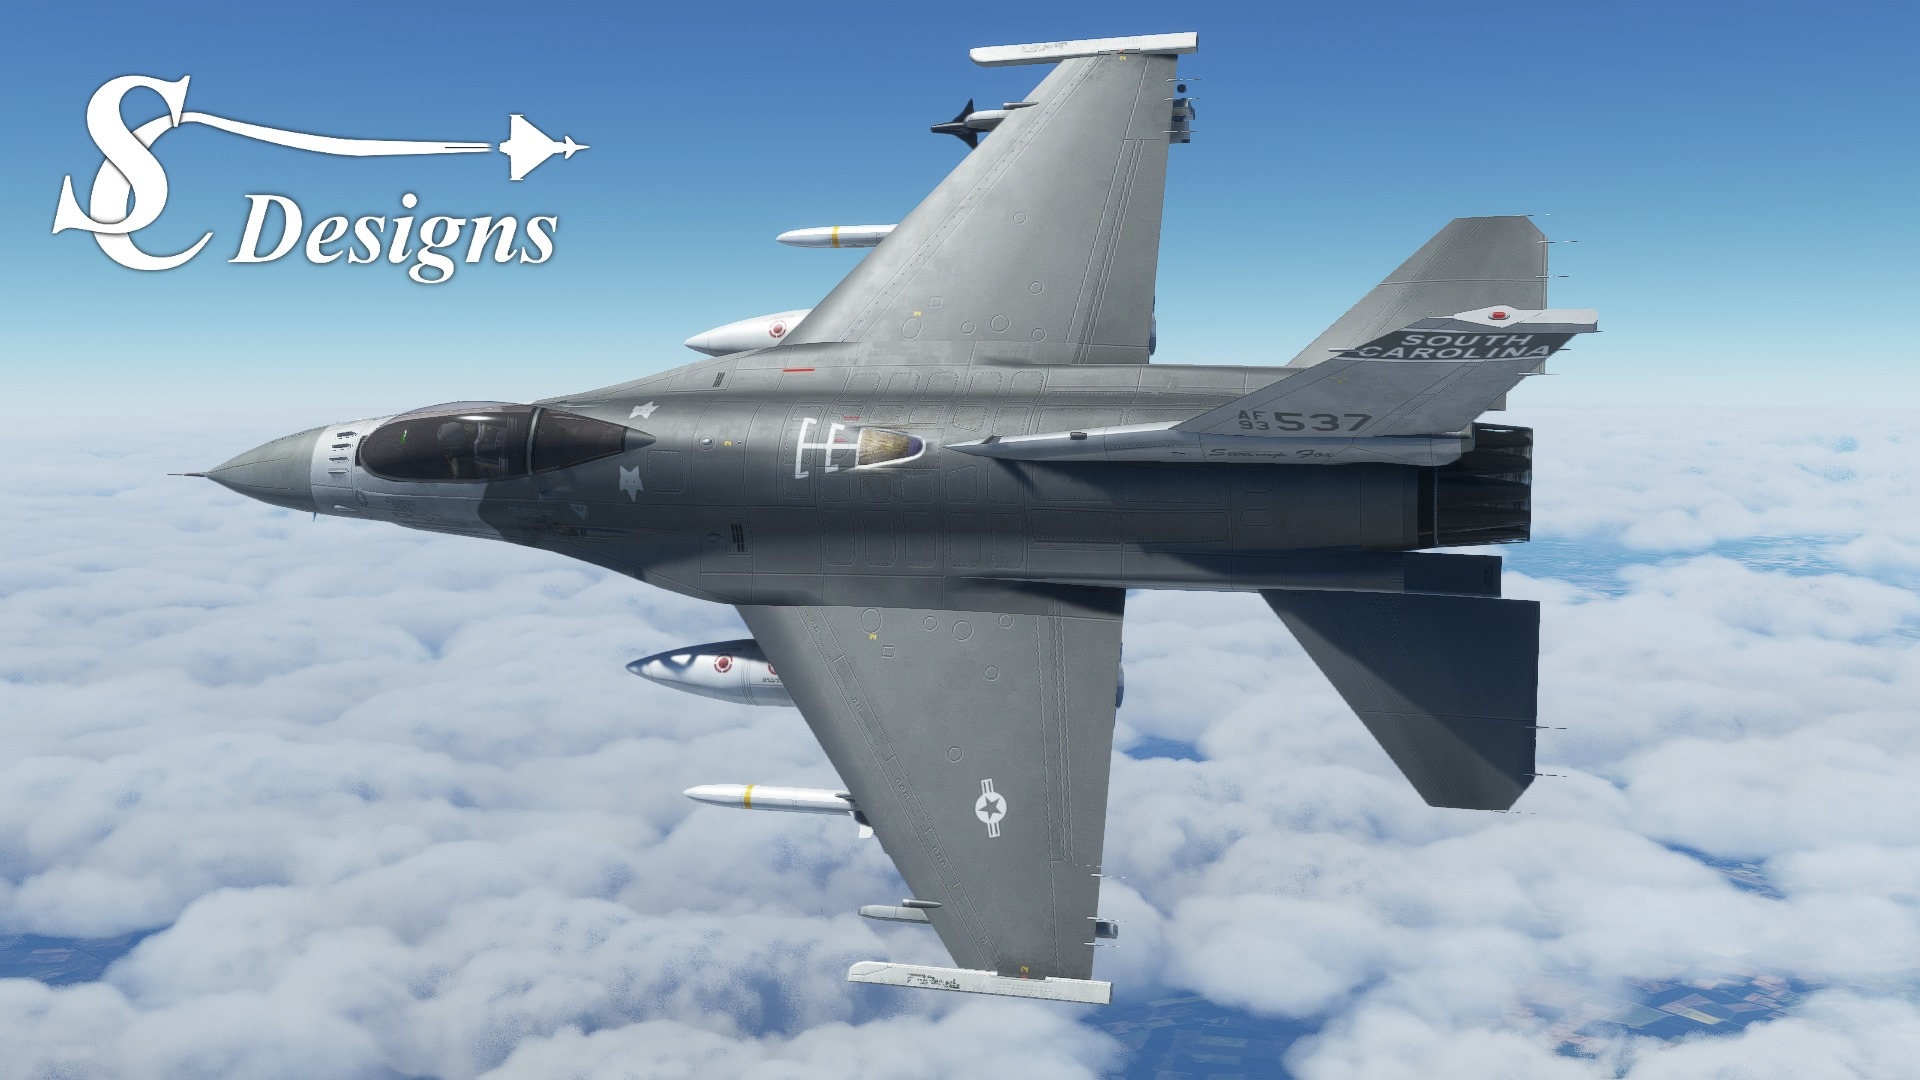 Microsoft Flight Simulator F 16 Fighting Falcon Announced Hawk T1 Su 31 Get New Screenshots Stearman Releases Tomorrow